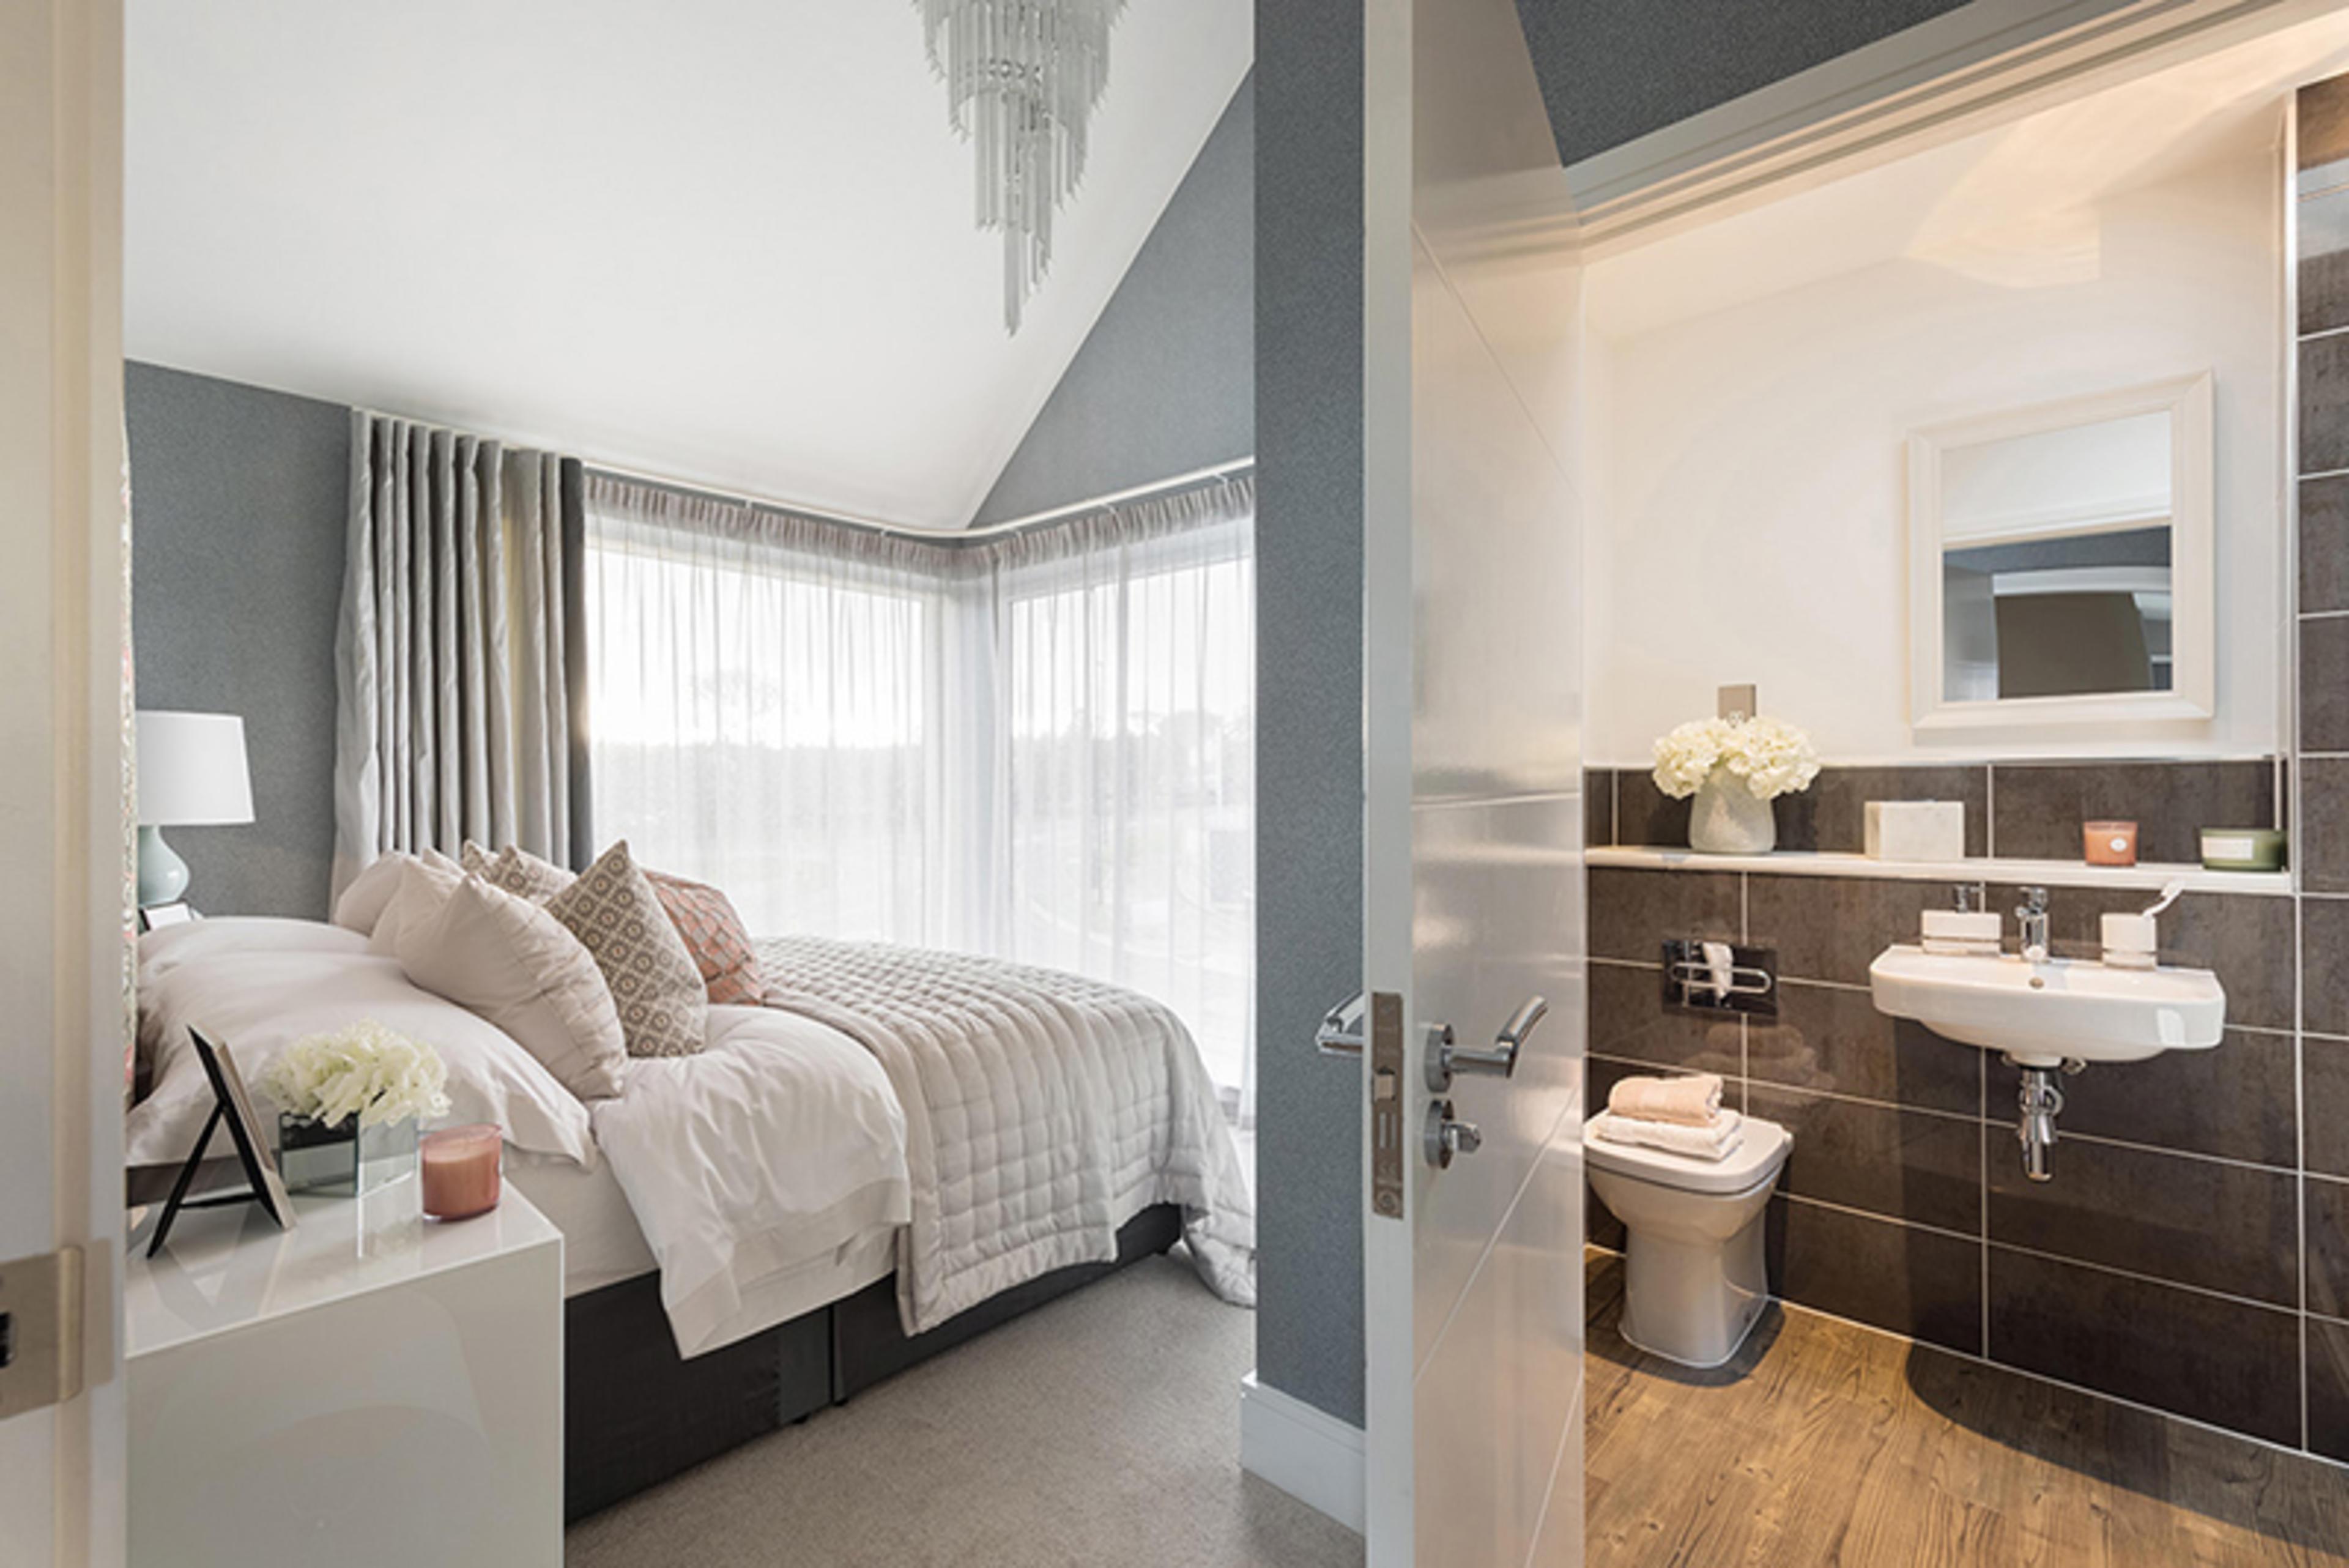 watling-grange-harrogate-calder-3-bed-home-master-bedroom-1